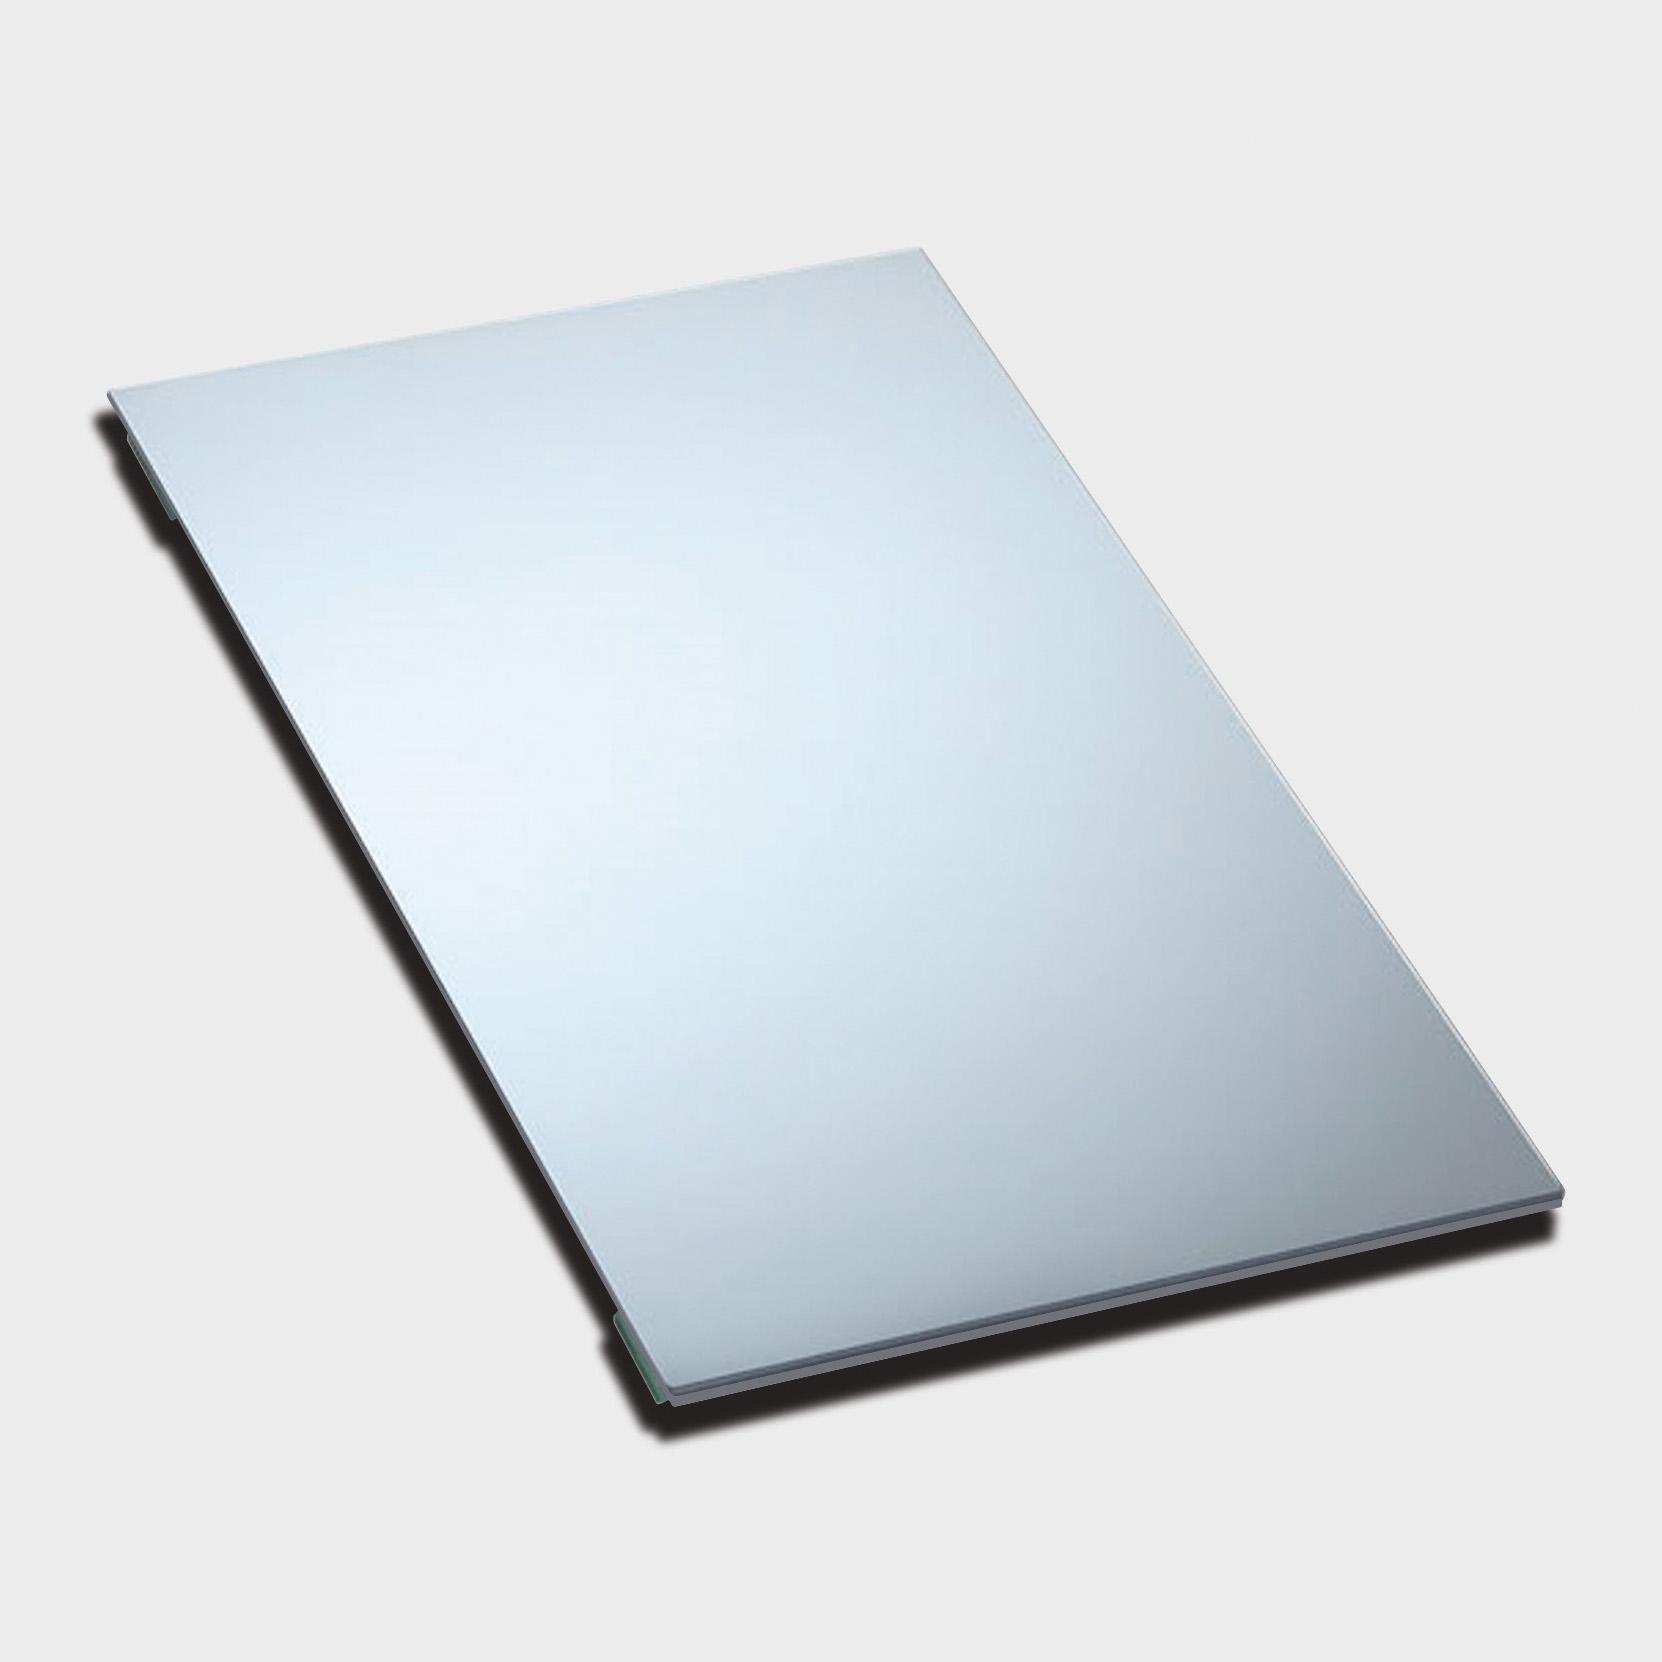 Доска разделочная стеклянная TVSG